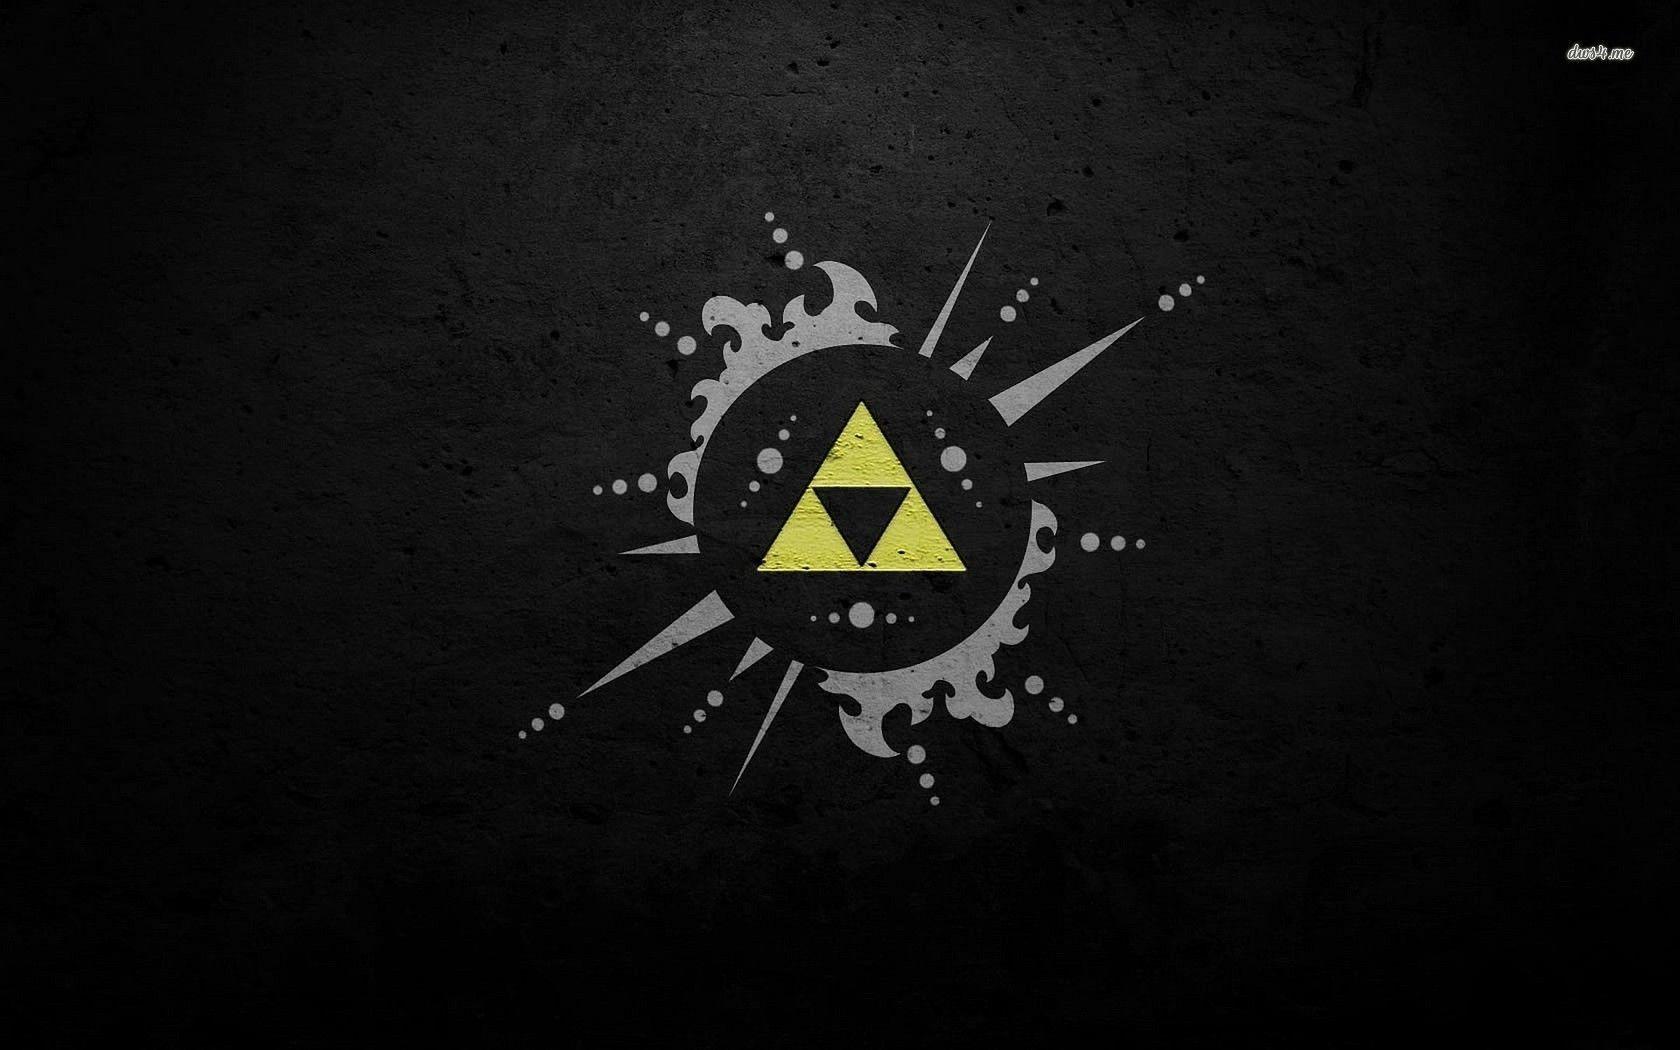 Triforce The Legend Of Zelda HD Desktop Wallpaper : High